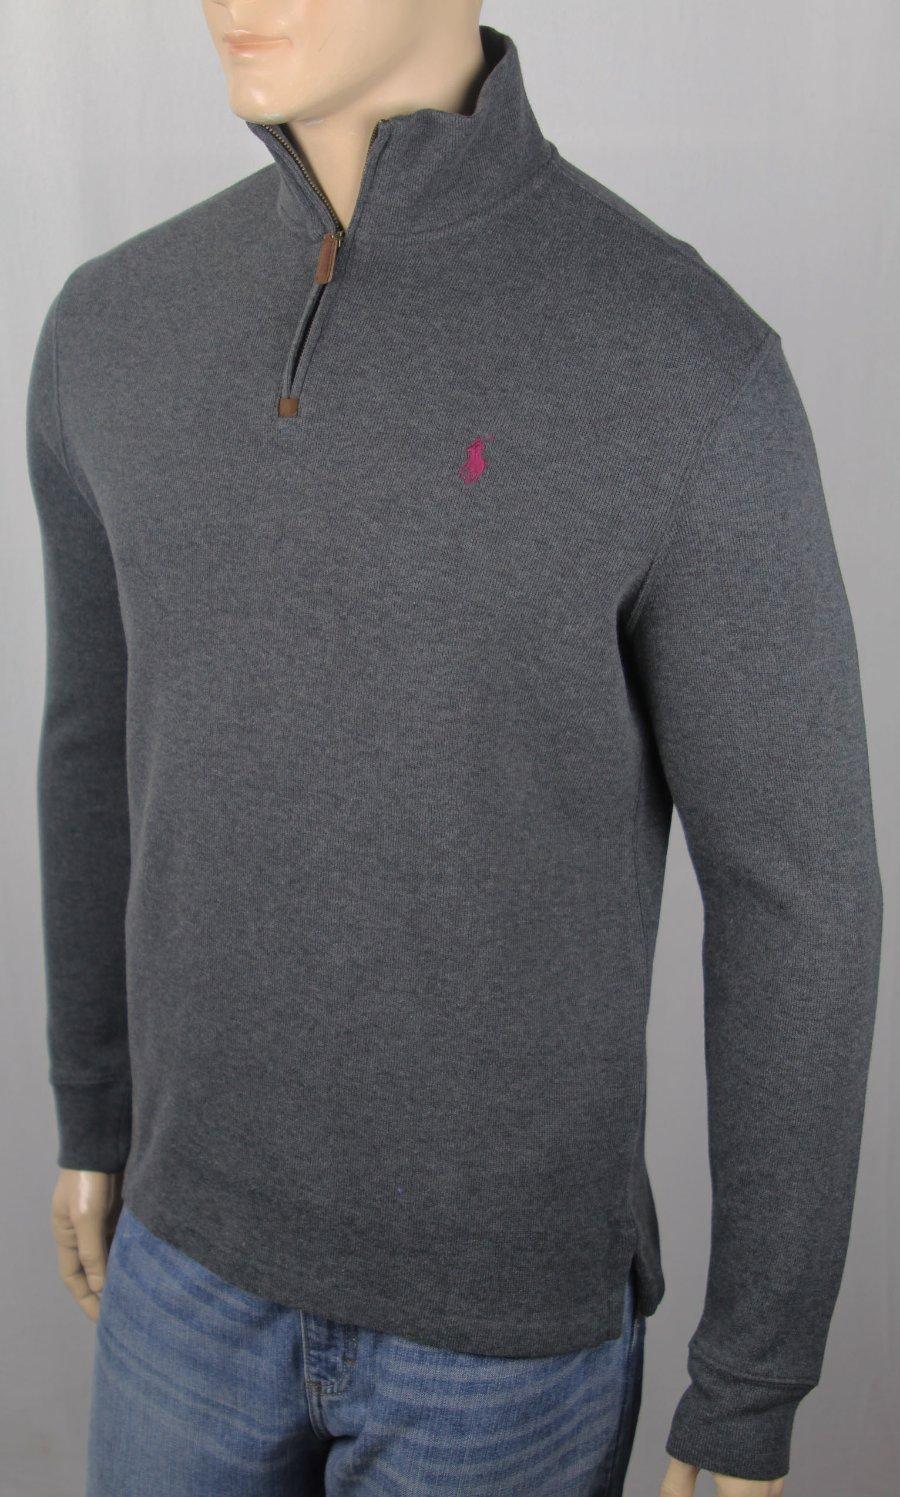 Polo Ralph Lauren 1//2 Half Zip French Rib Sweater $115 Green Red Blue w Pony NWT